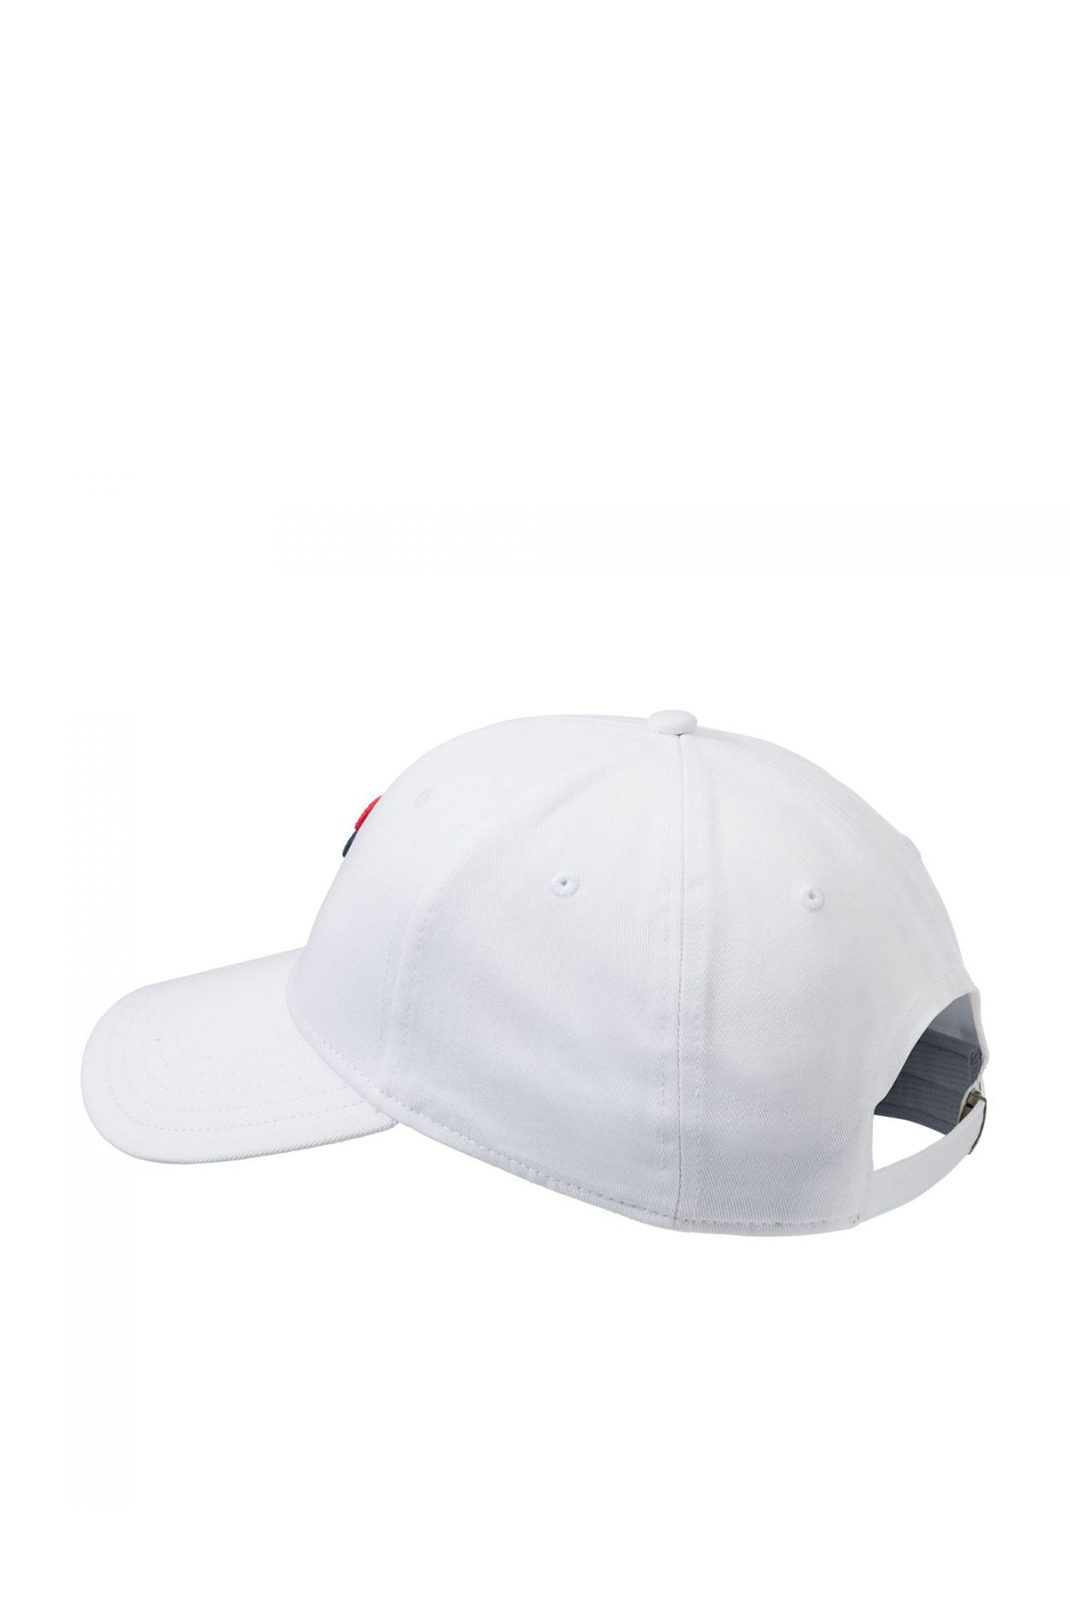 Bonnets / Casquettes  Fila 686025 unisex M67 BRIGHT WHITE